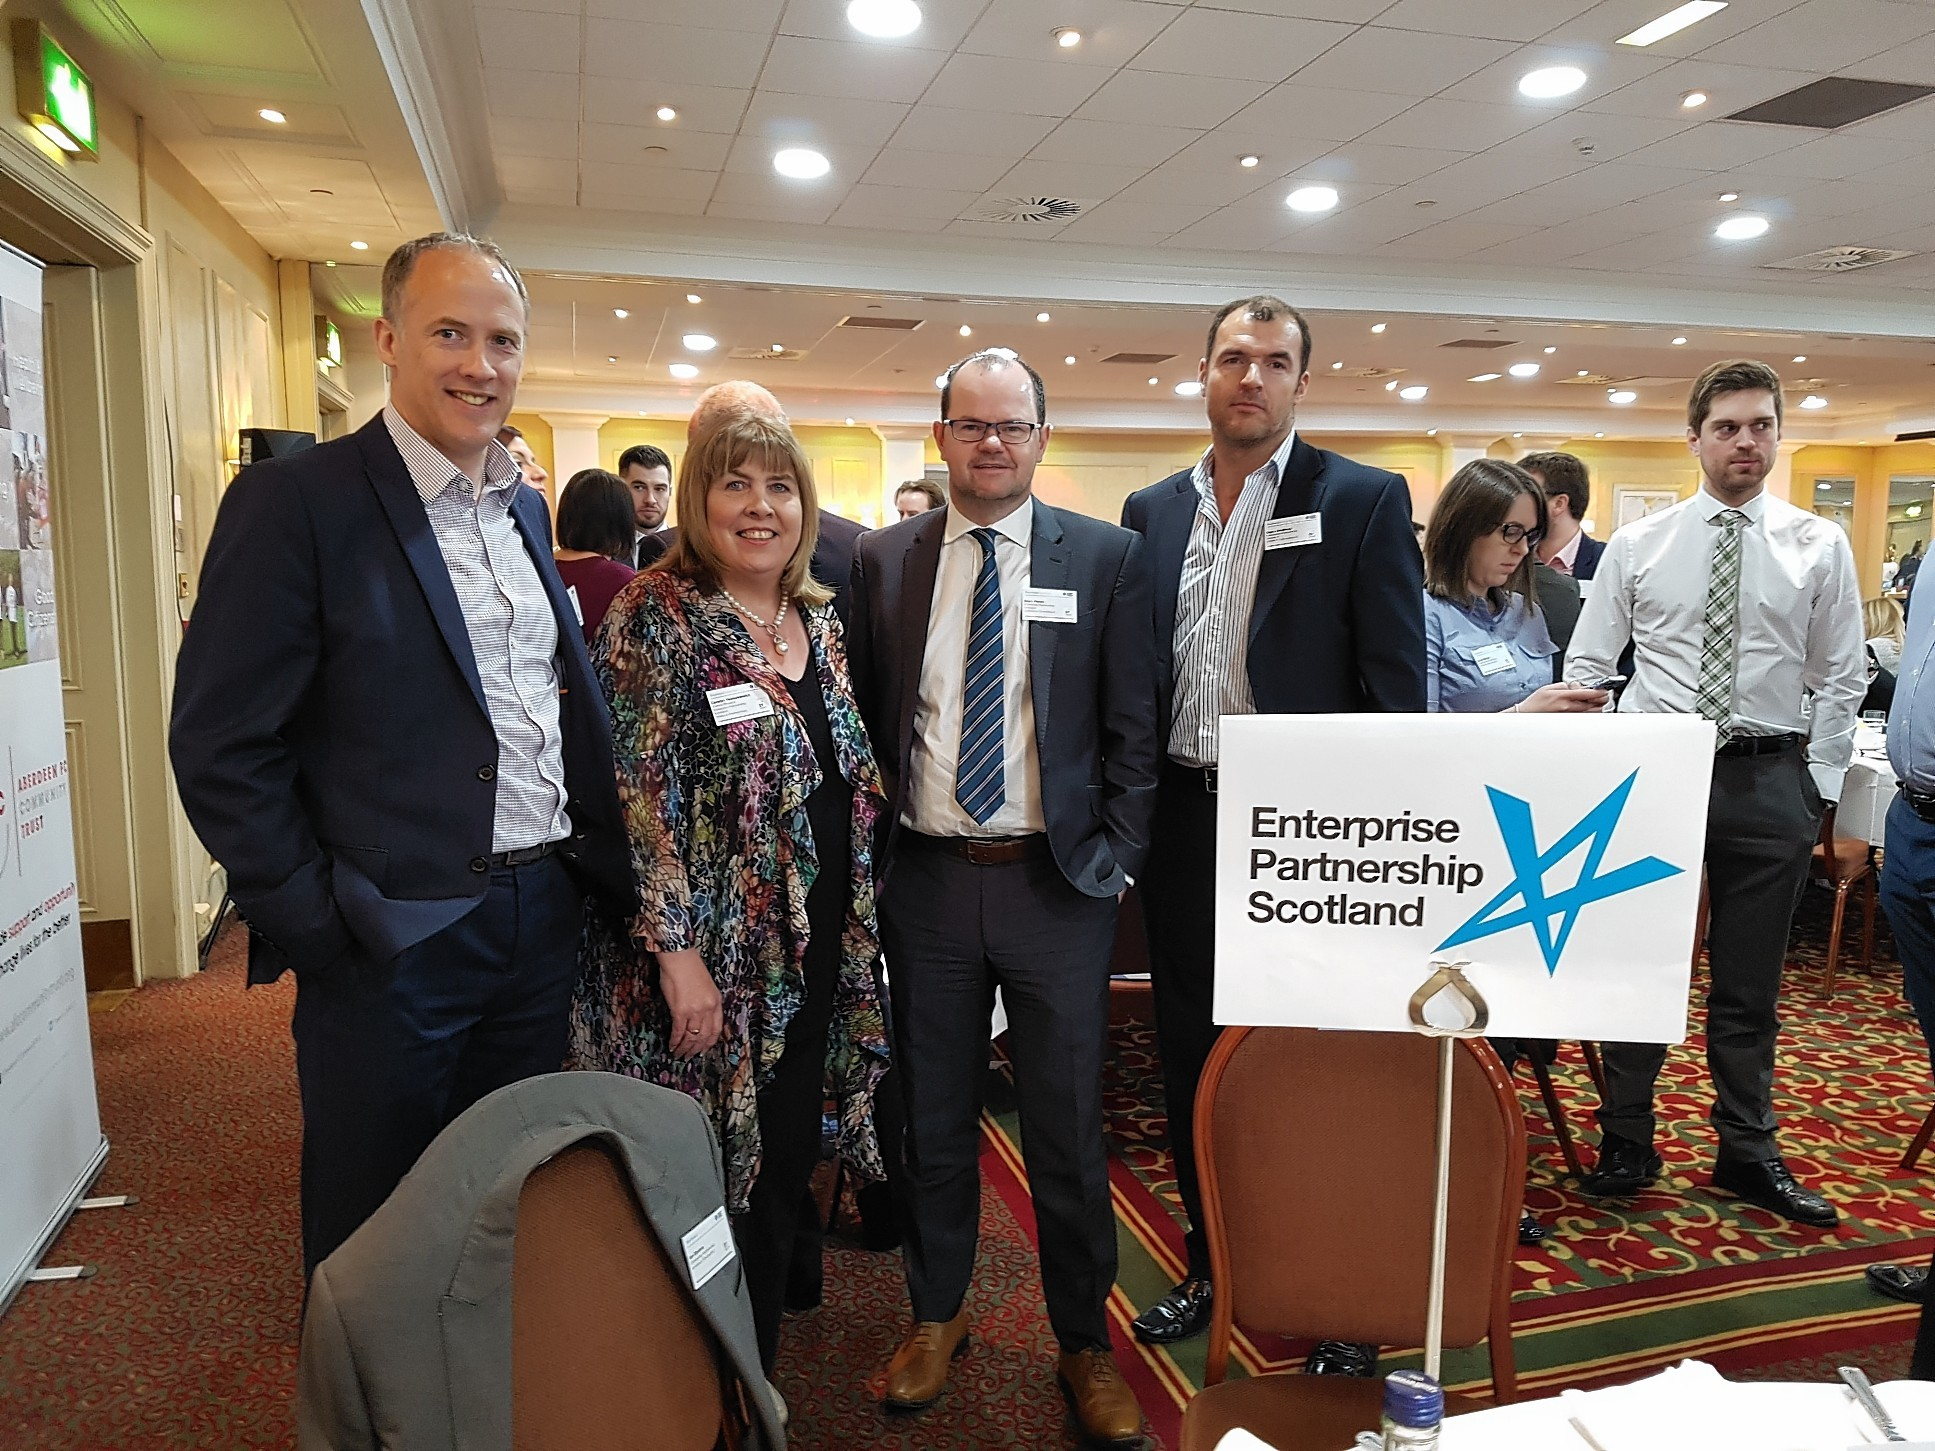 L - R: Stephen Hepburn (Head of Customer Banking, Aberdeen); Carolyn Maniukiewicz (Director, Ideas In Partnership); Brian Moran (Audit Partner); Steve Redhead (Managing Director, Mother Technologies)